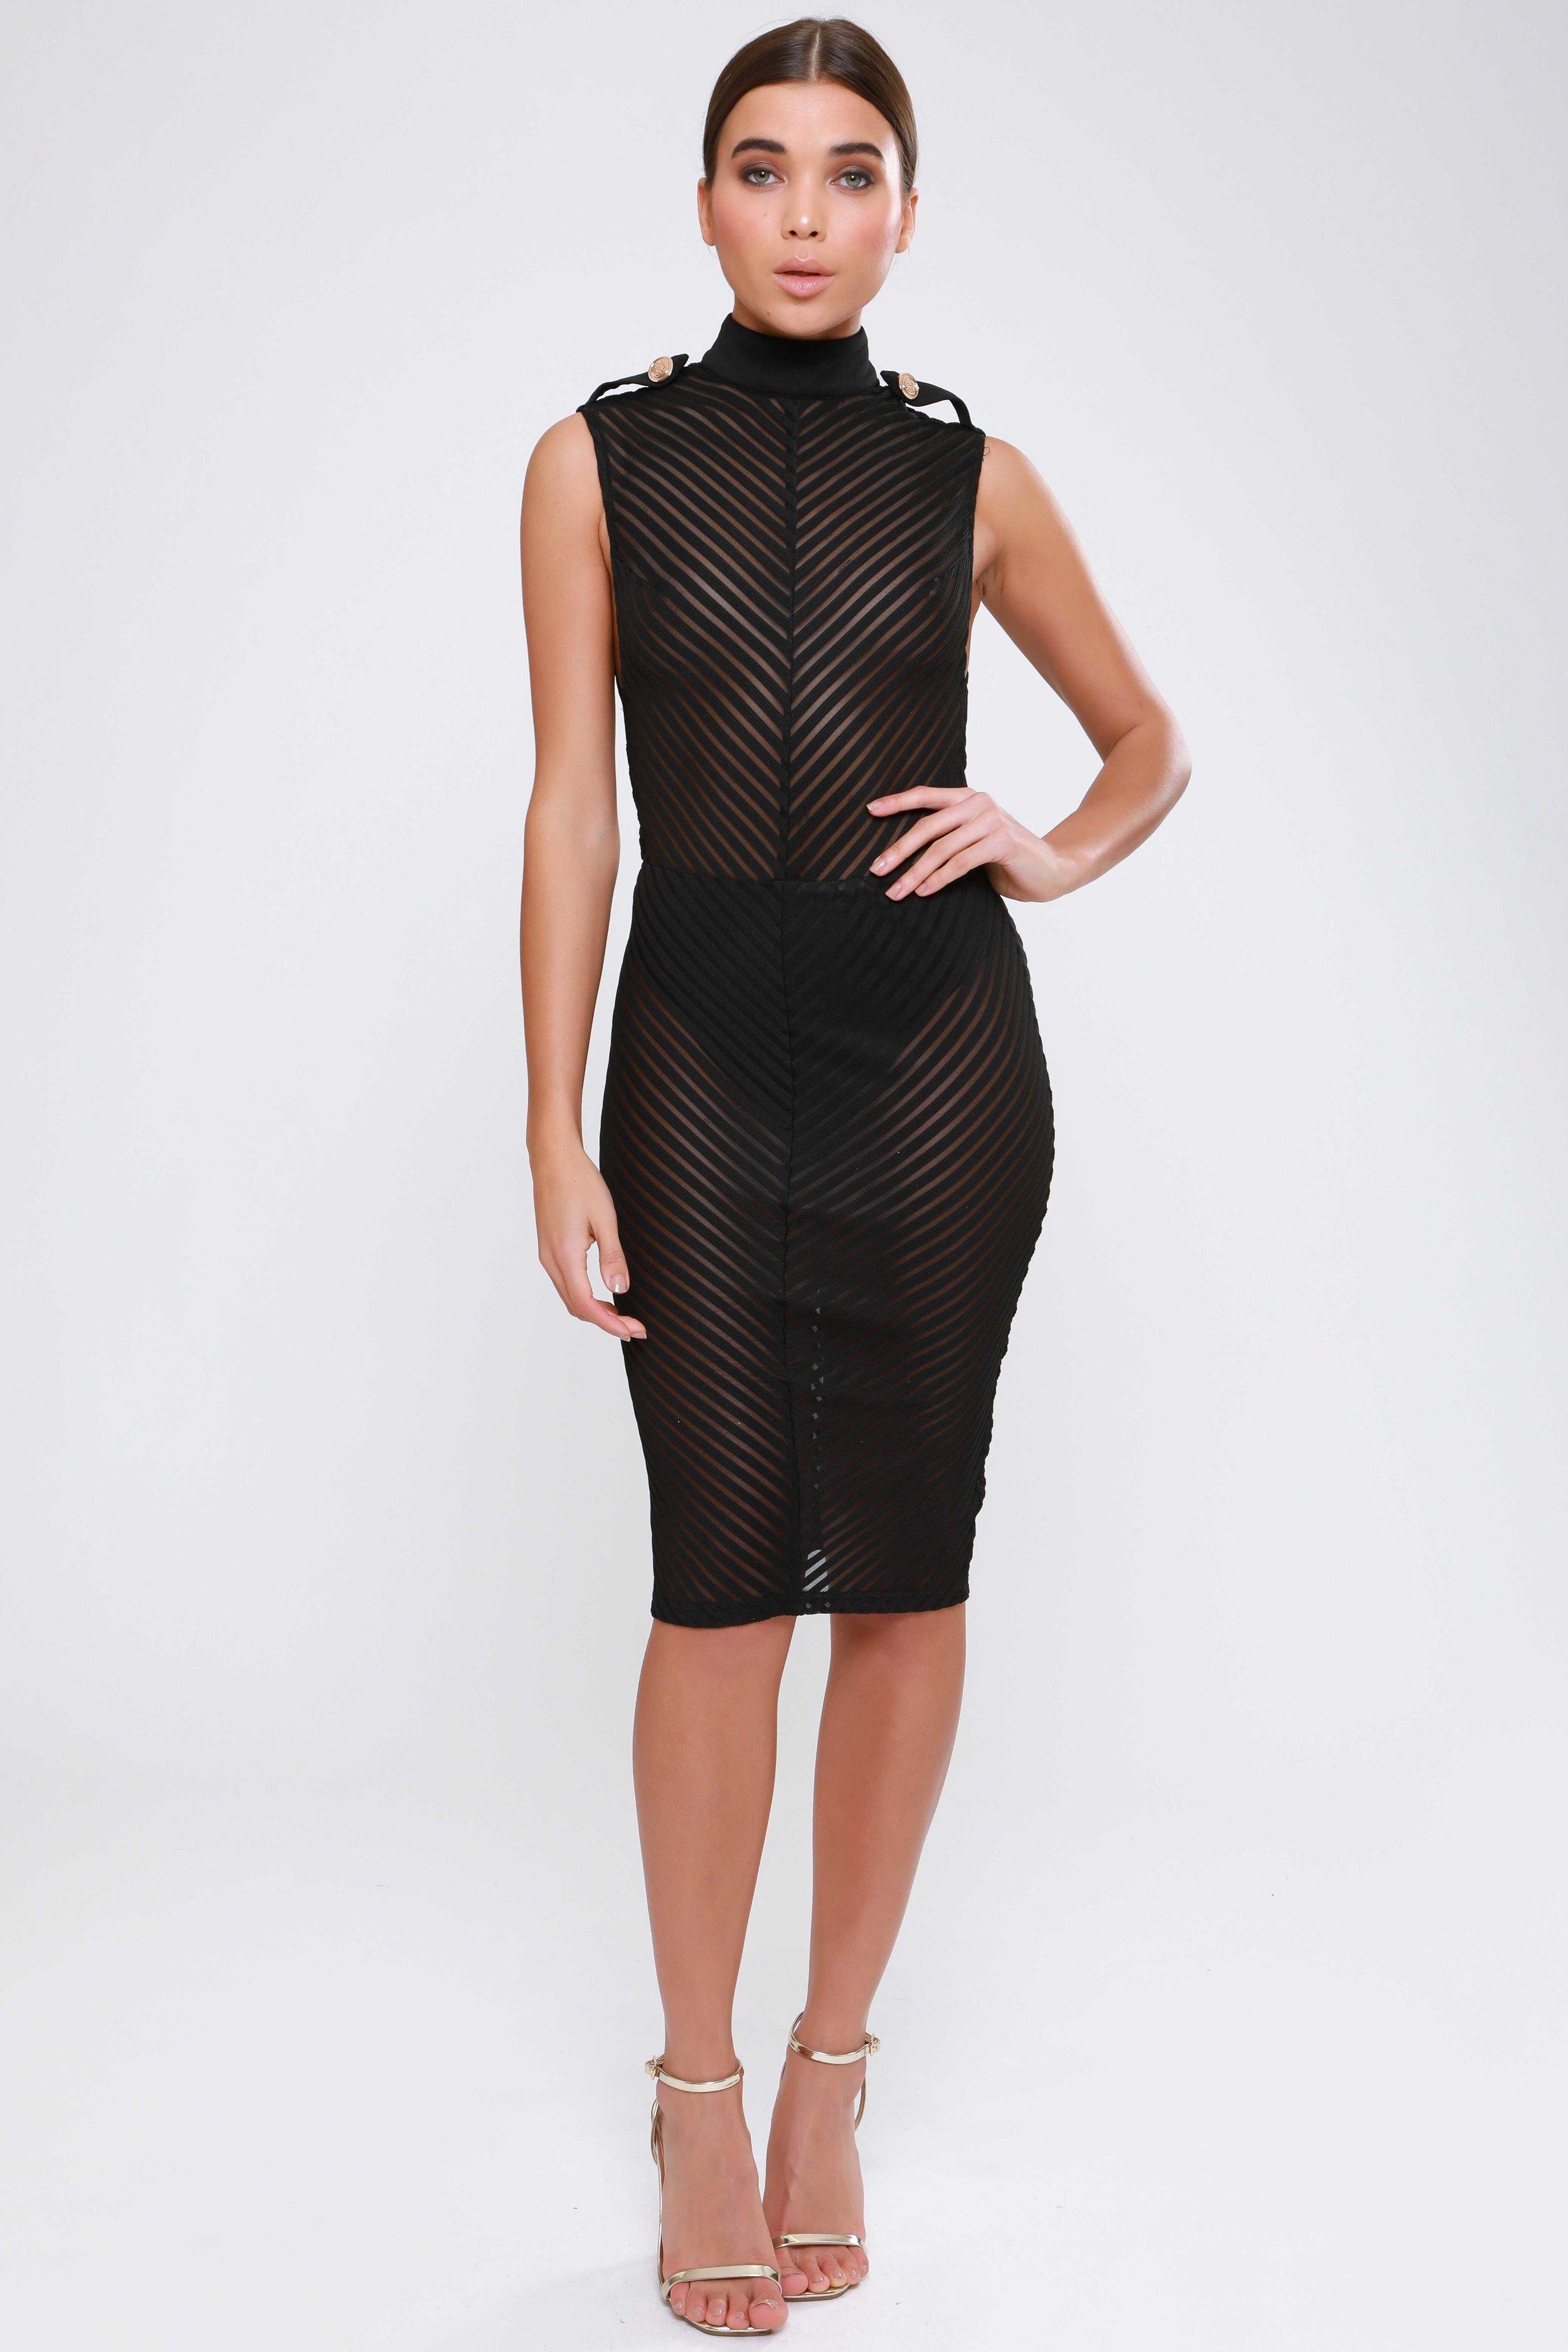 Sheer Striped Mesh  Midi Dress   £59.00